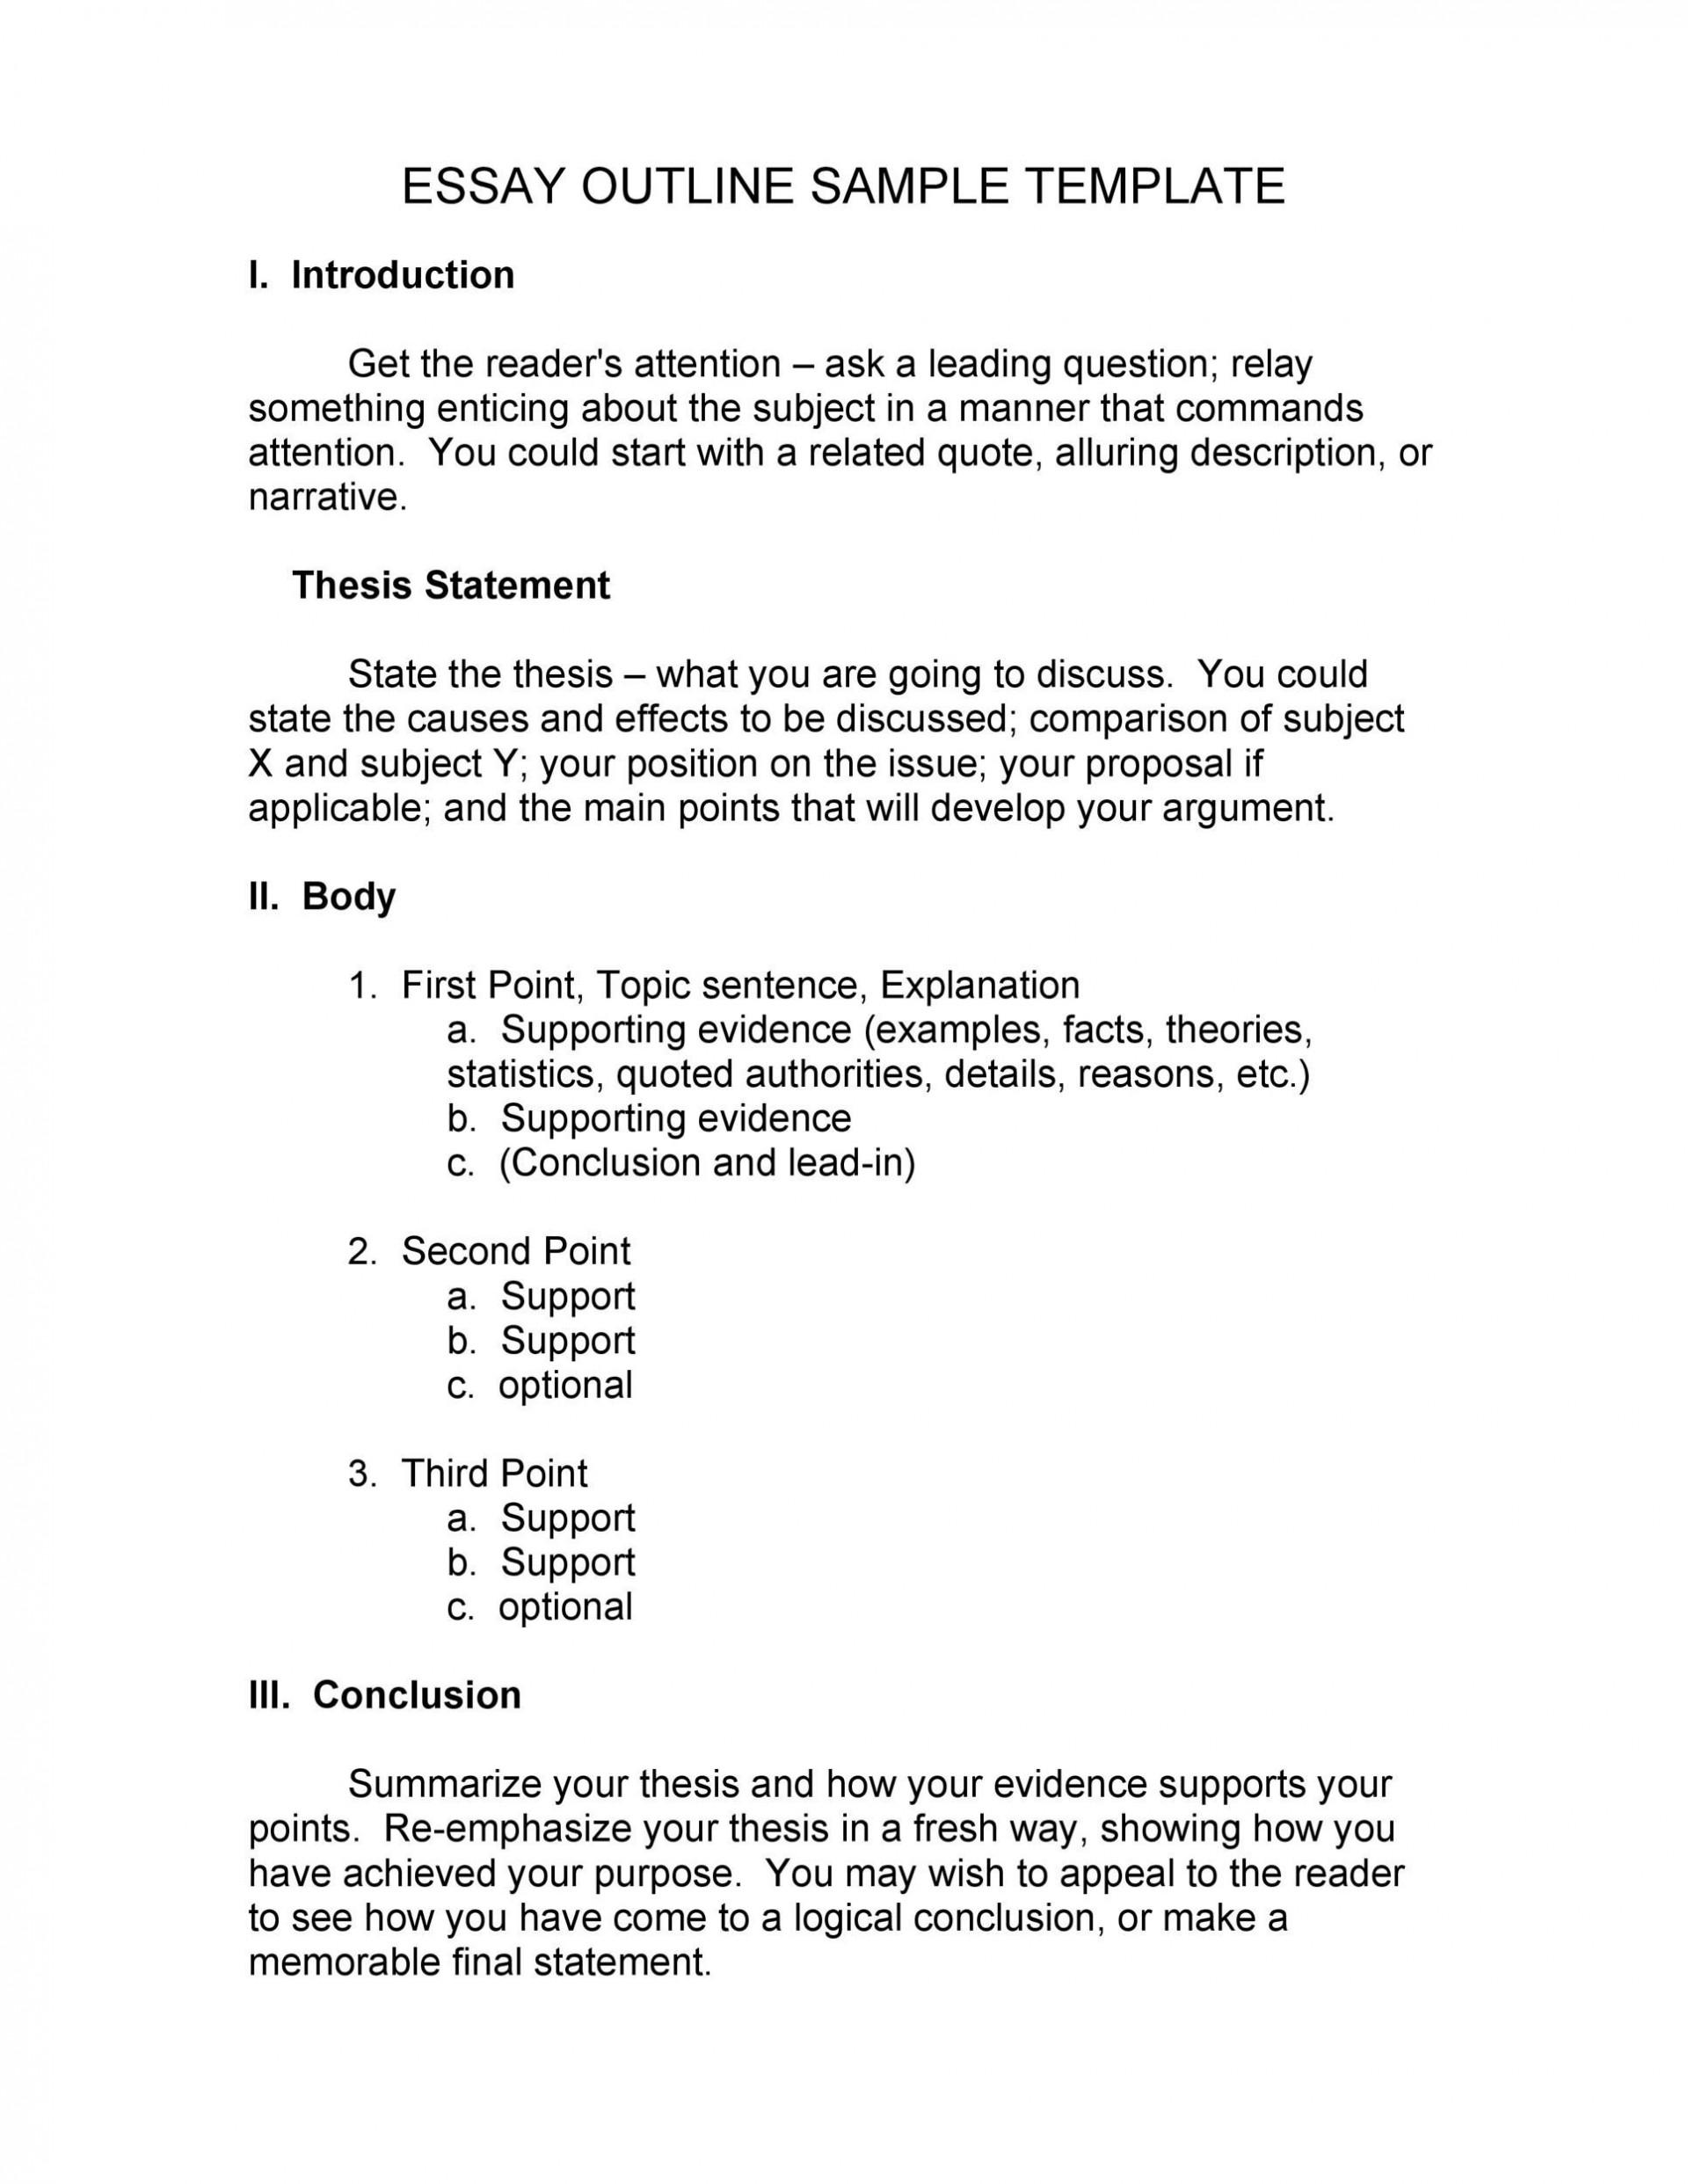 003 Excellent College Argumentative Essay Outline Template Photo  High School1920